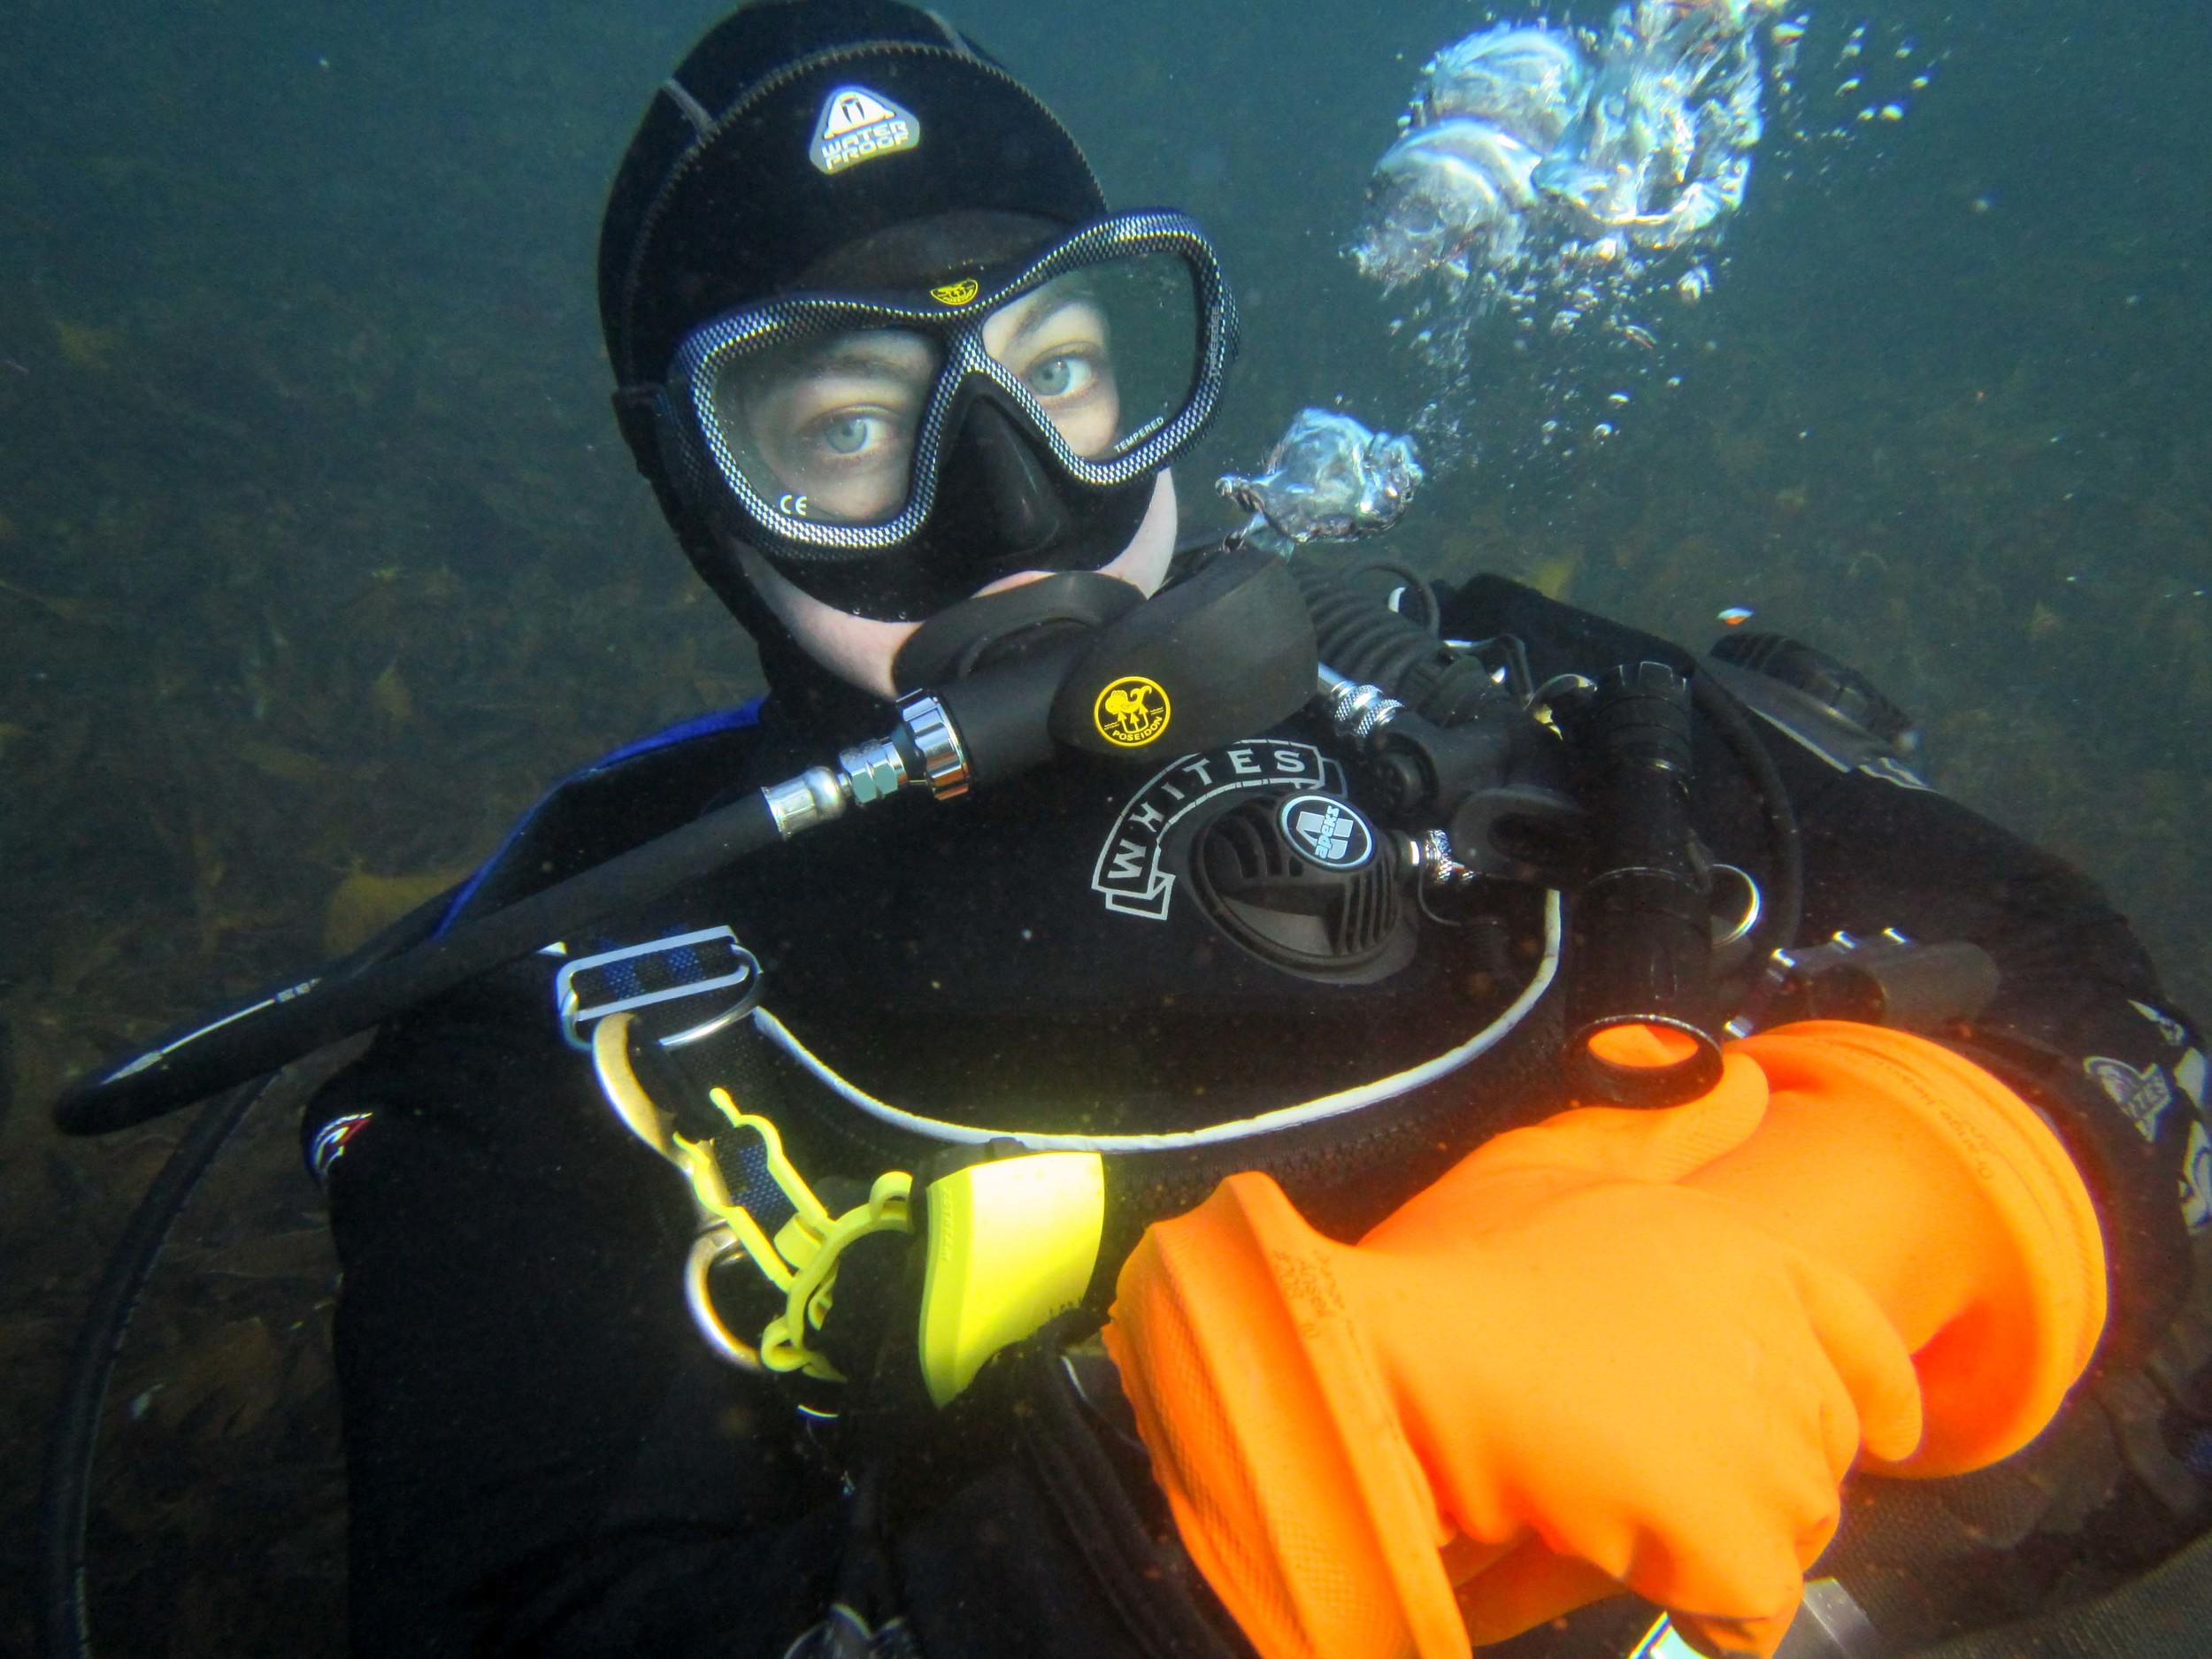 Just chilling underwater :)